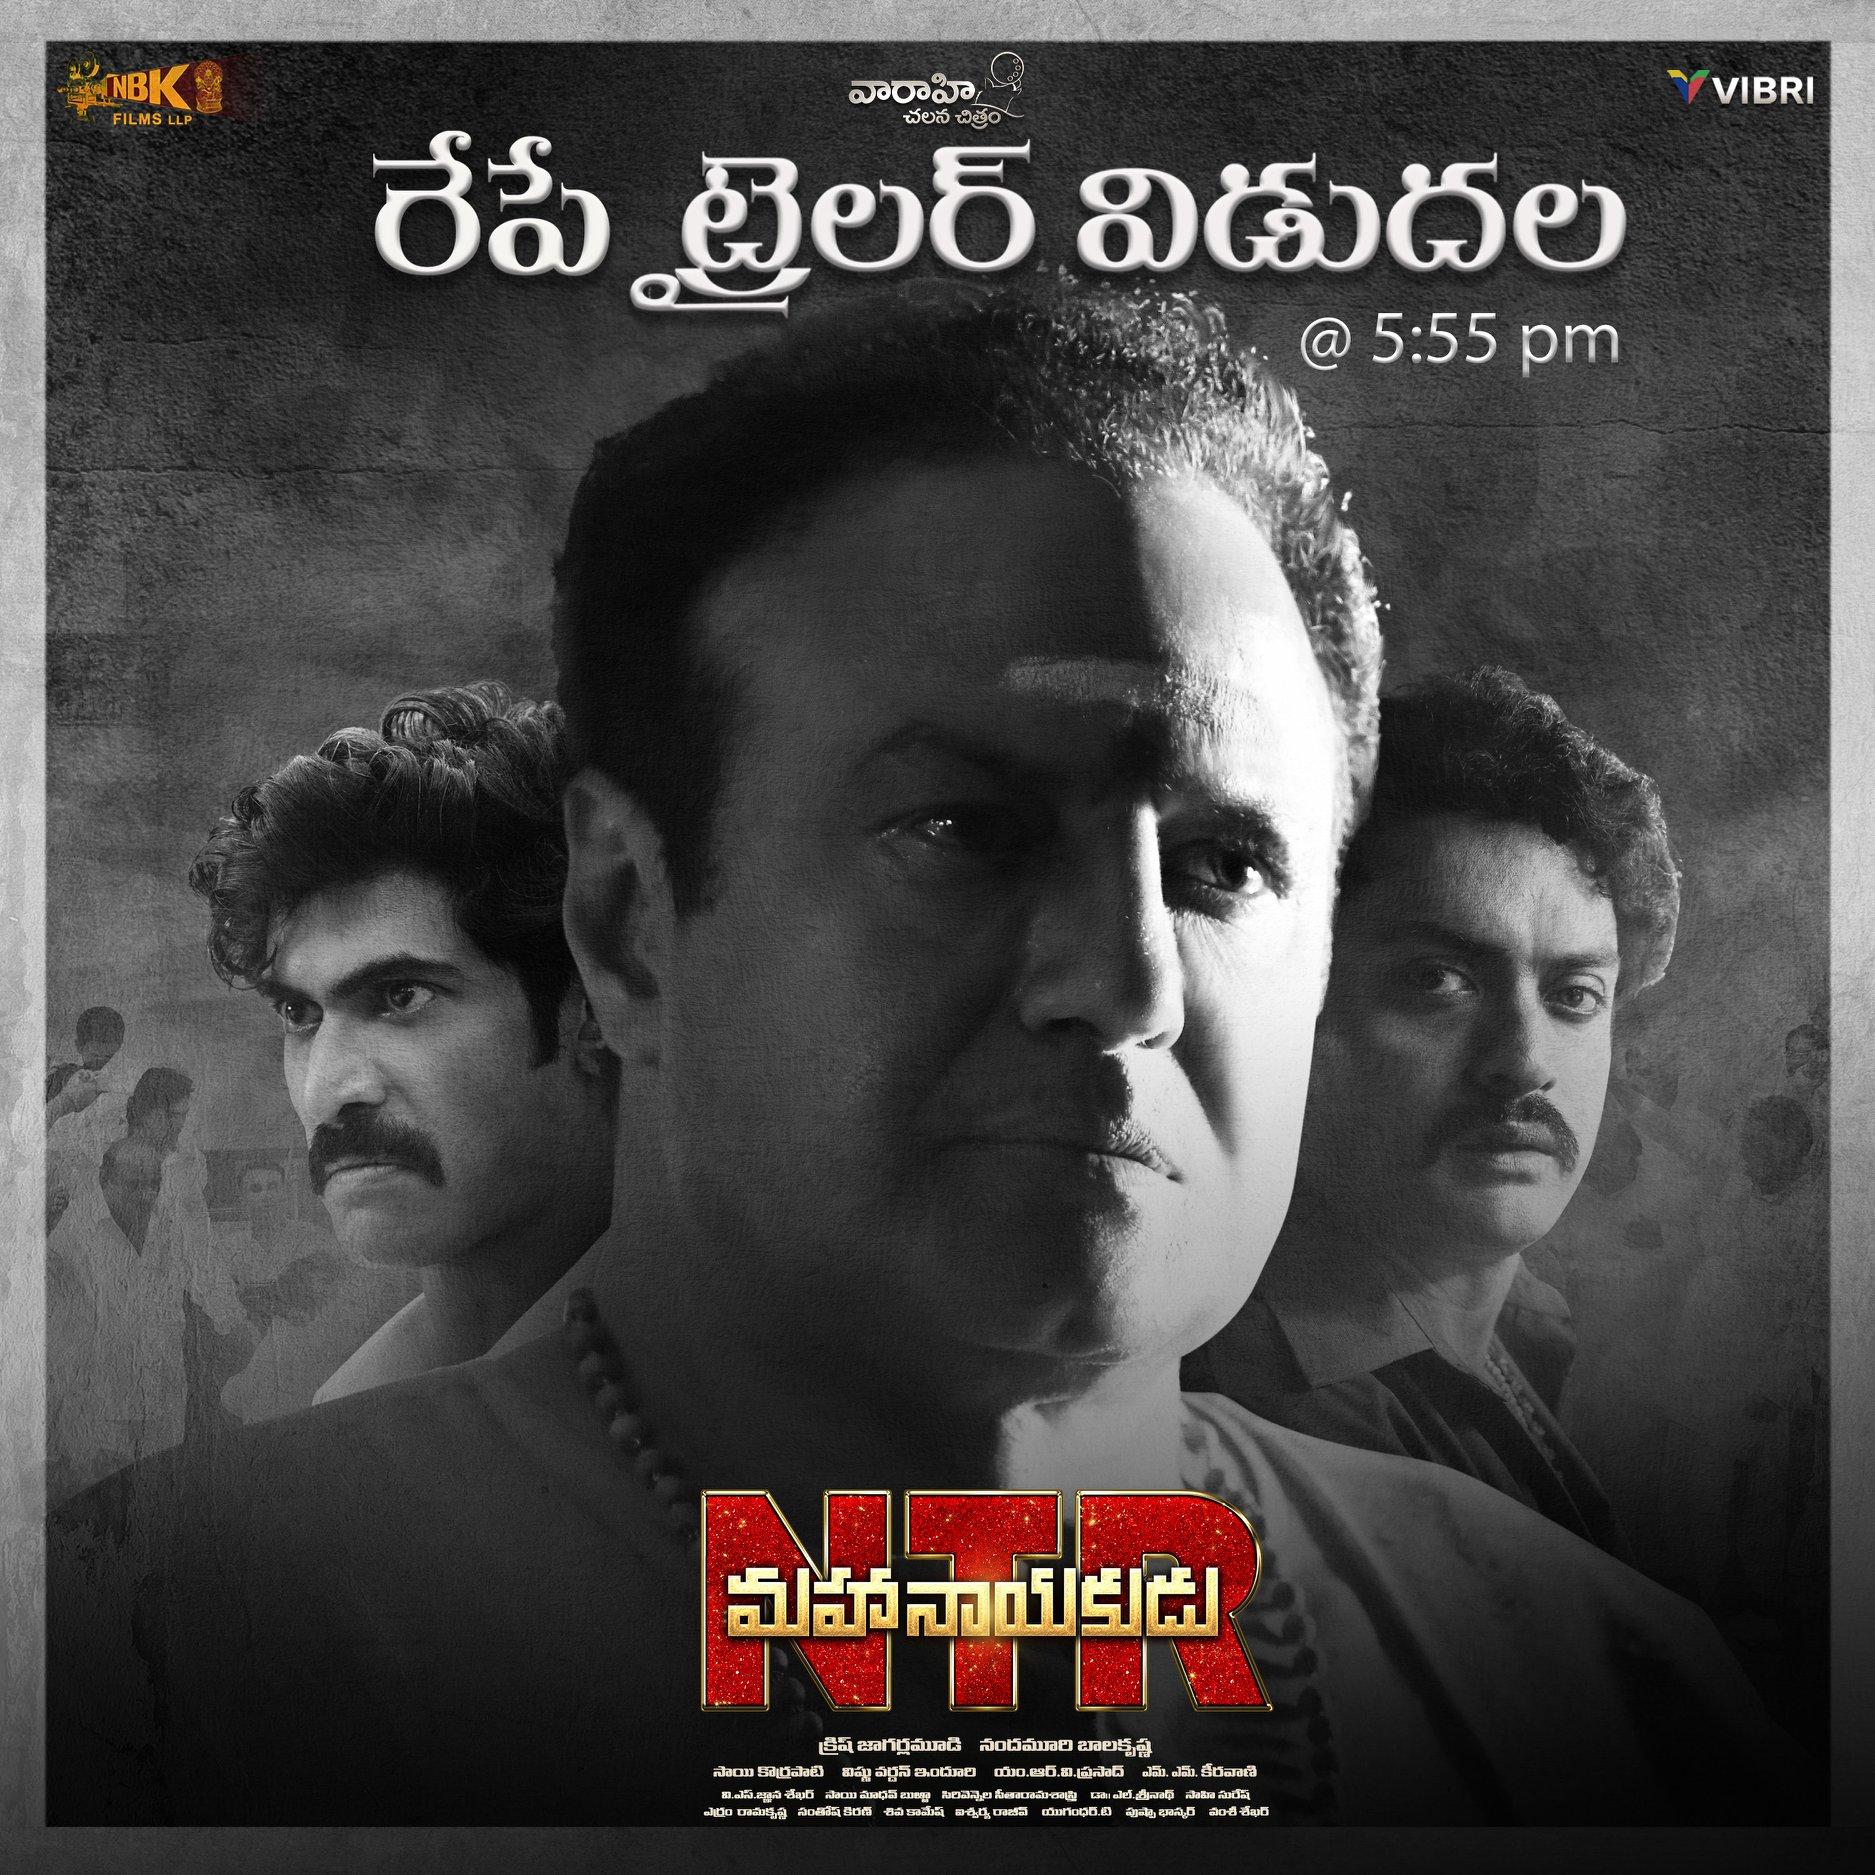 NTR Mahanayakudu Trailer Release Today on 555 PM Poster